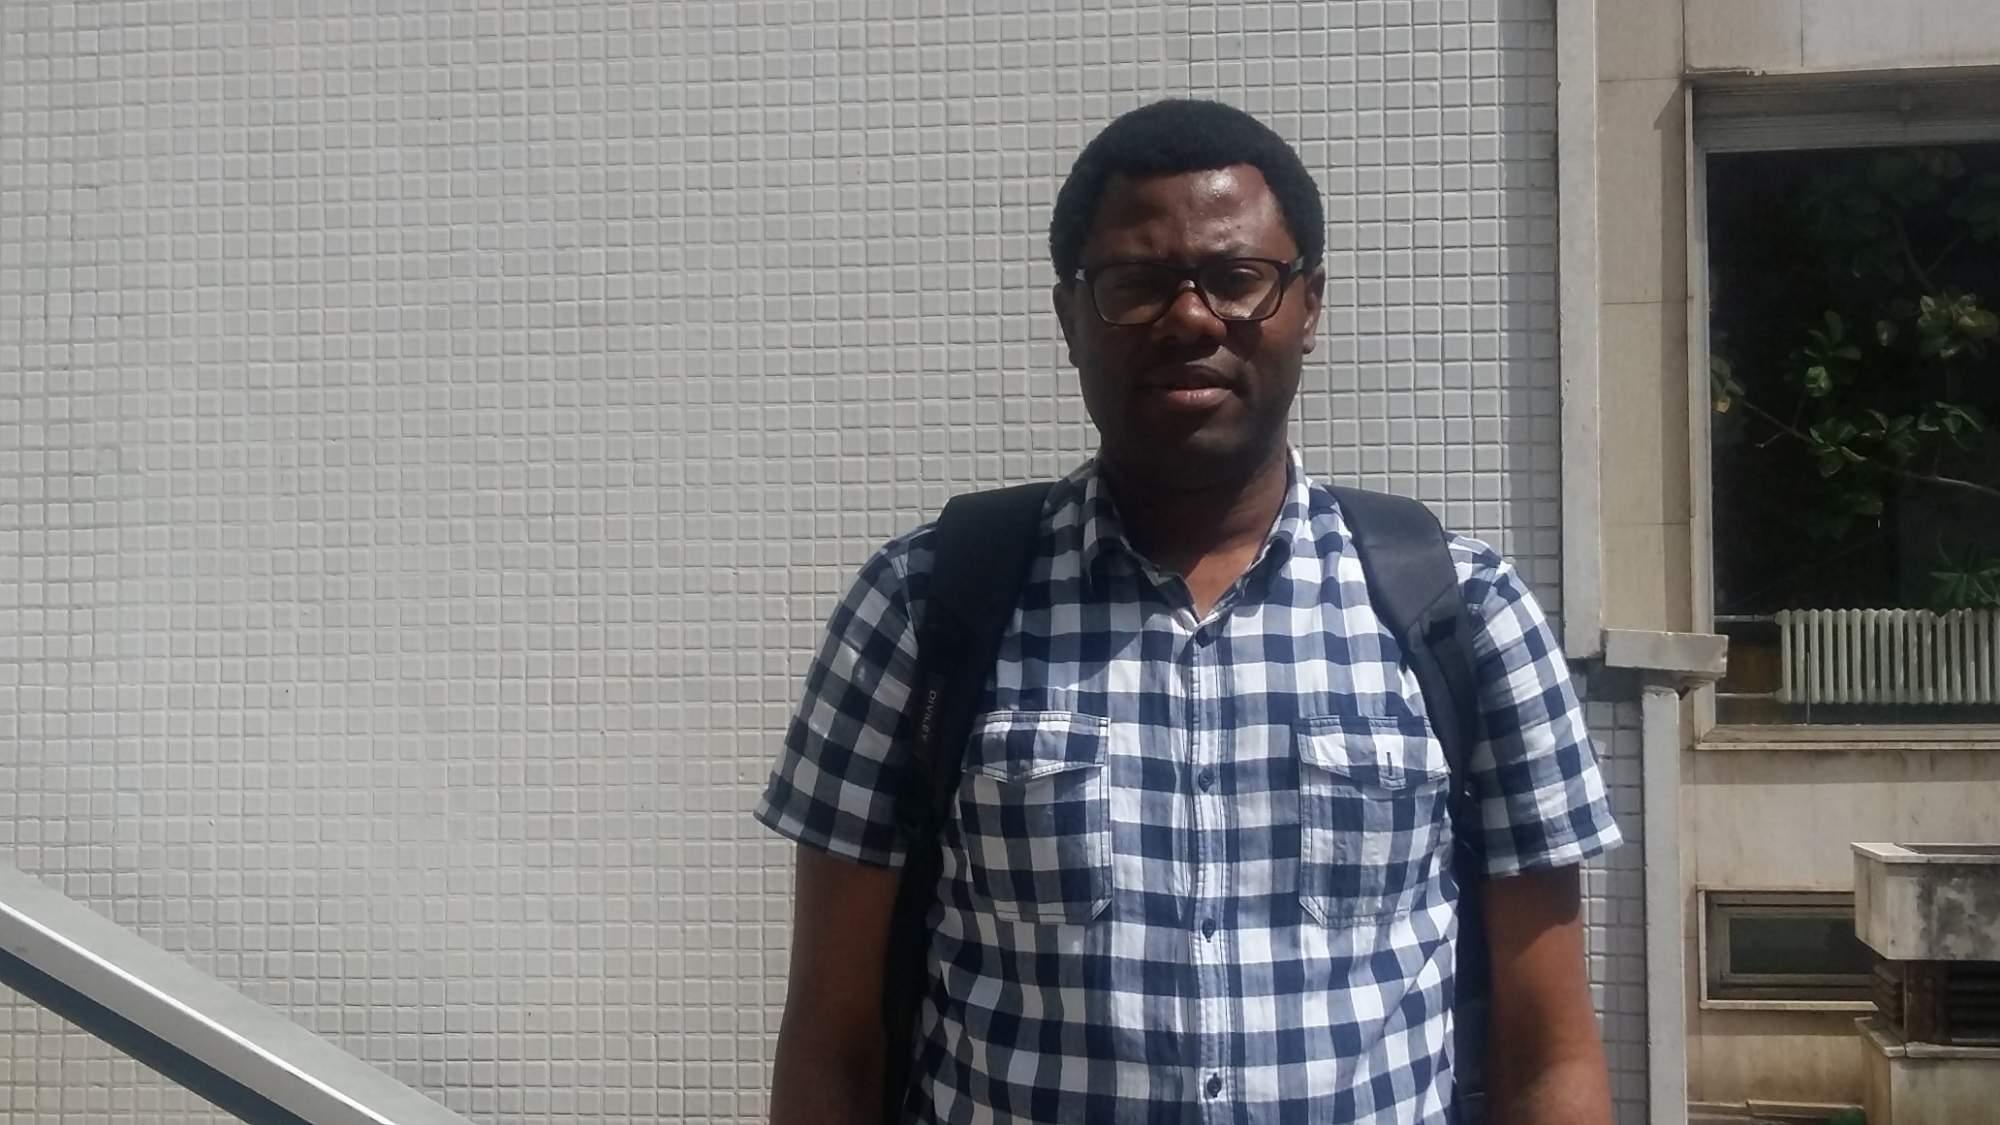 Francis Akwari žije v Česku už tři roky.